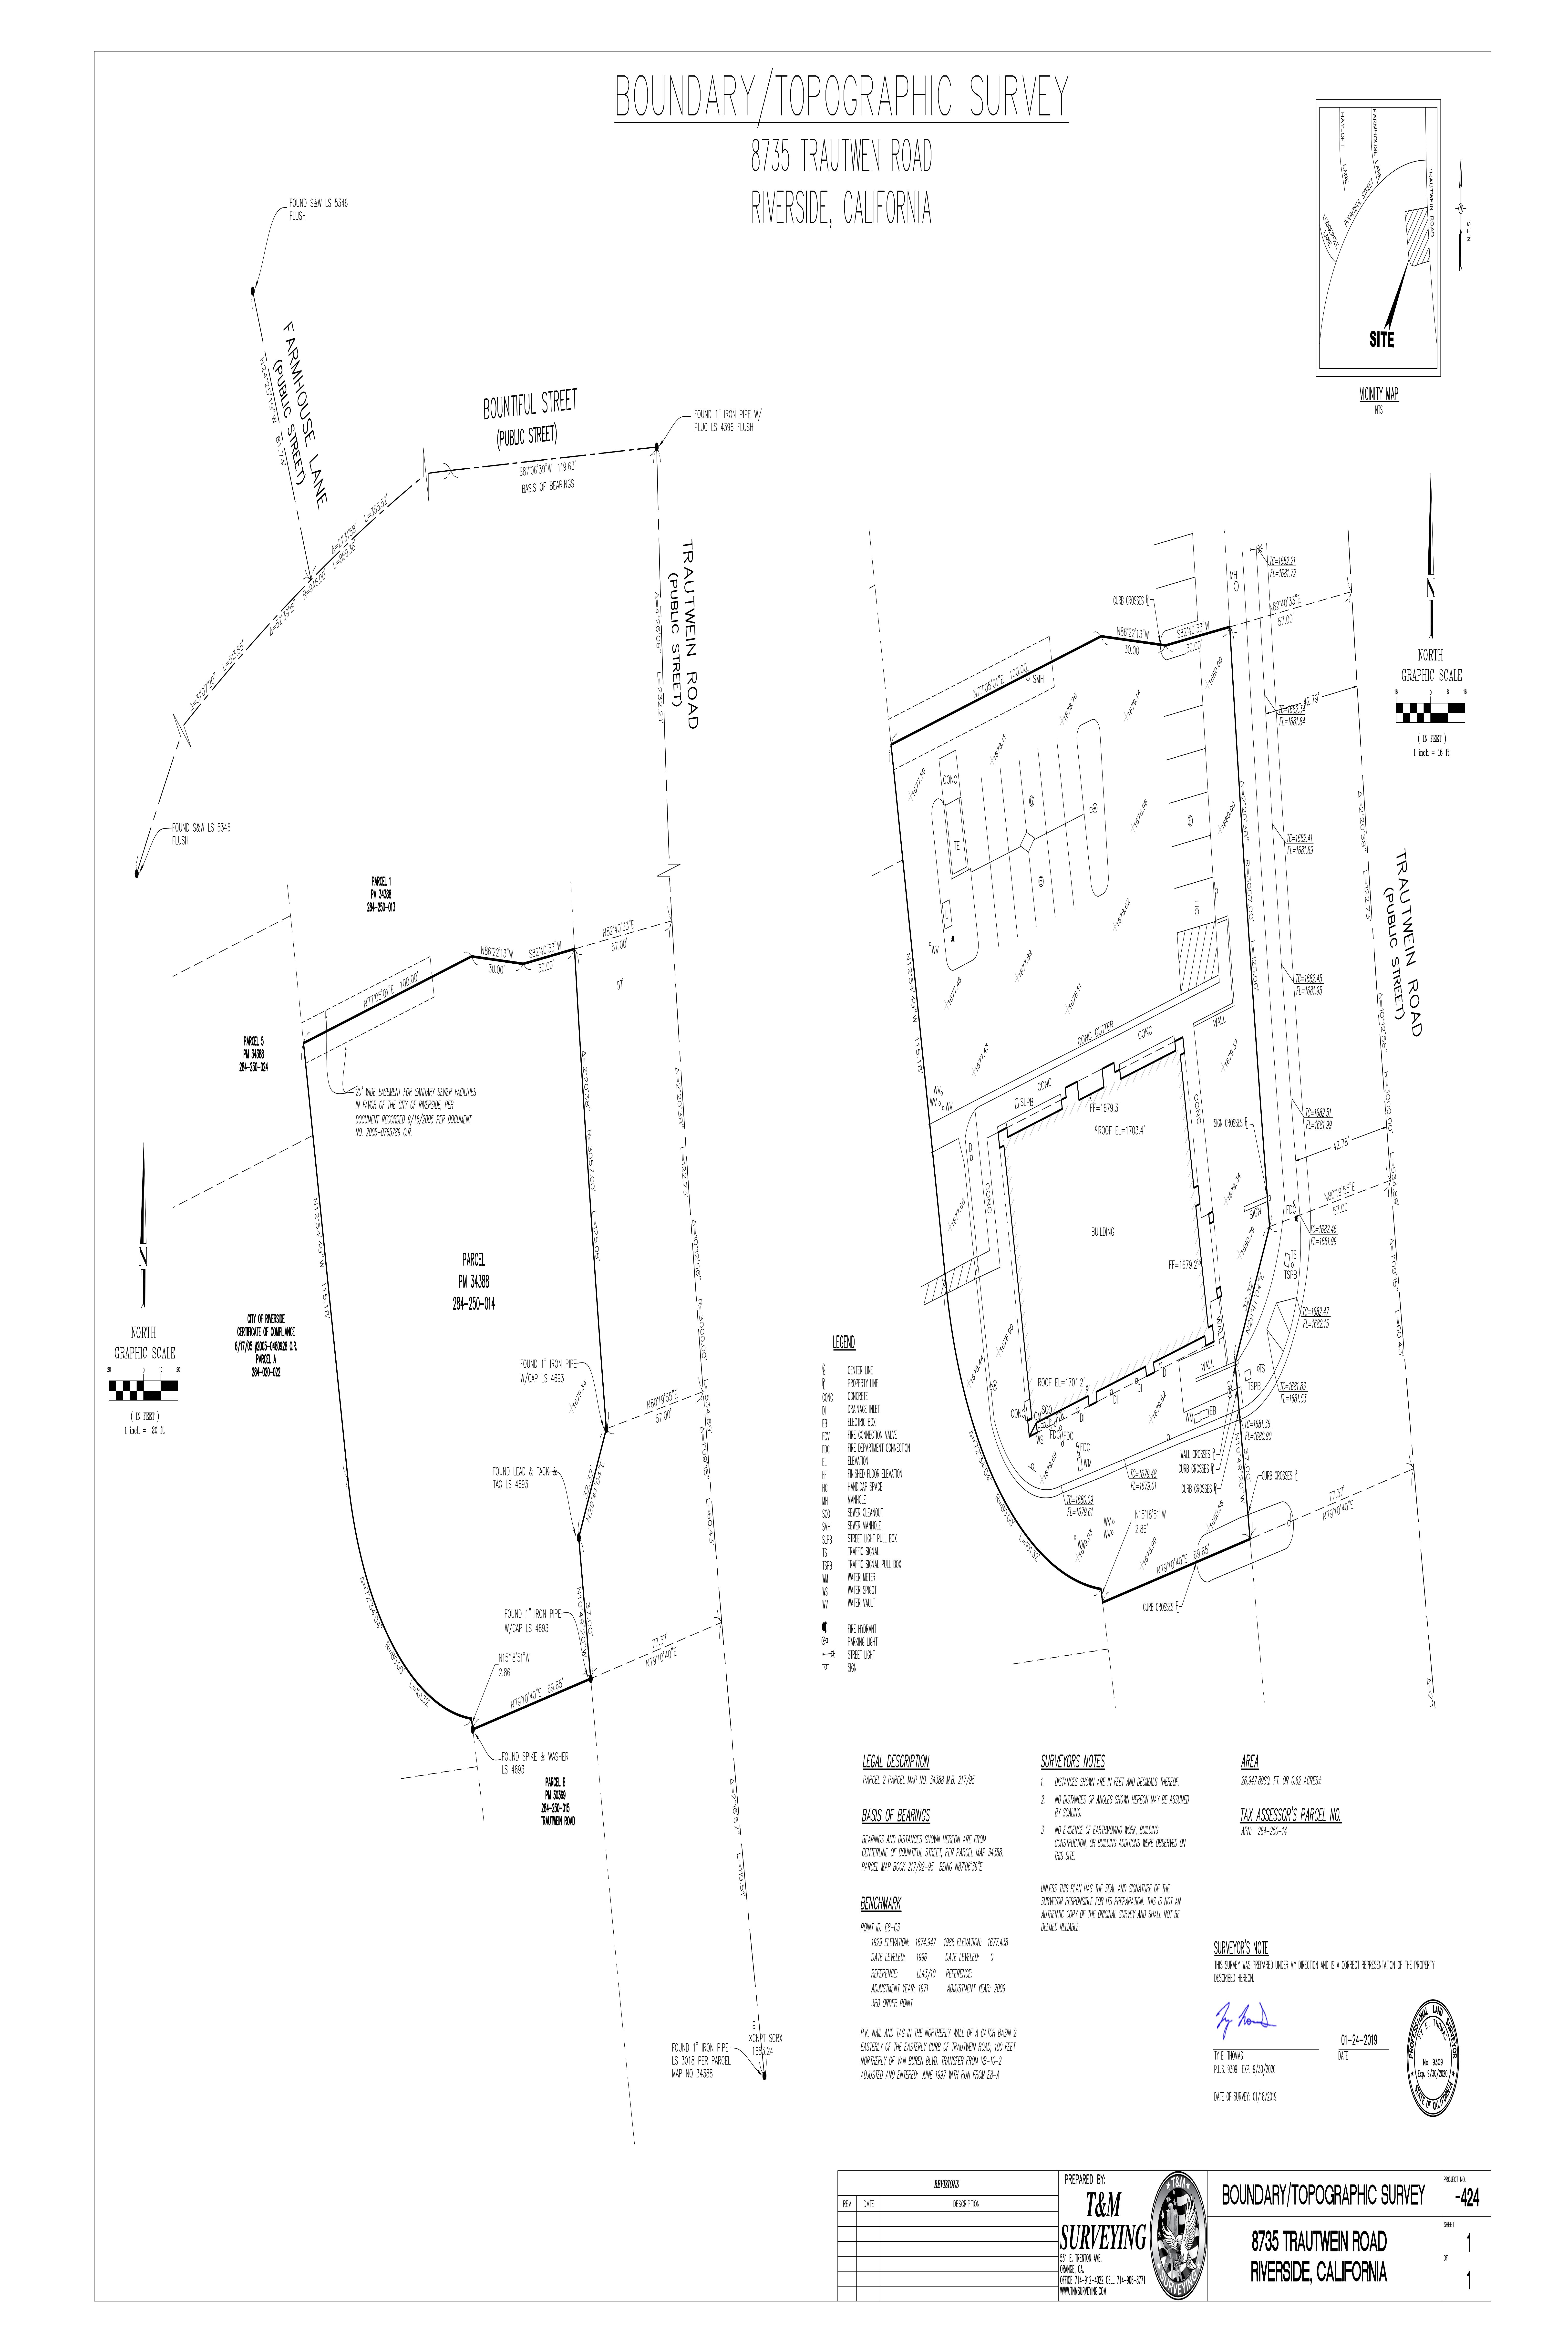 Orangecrest Towne Center - Riverside: site plan